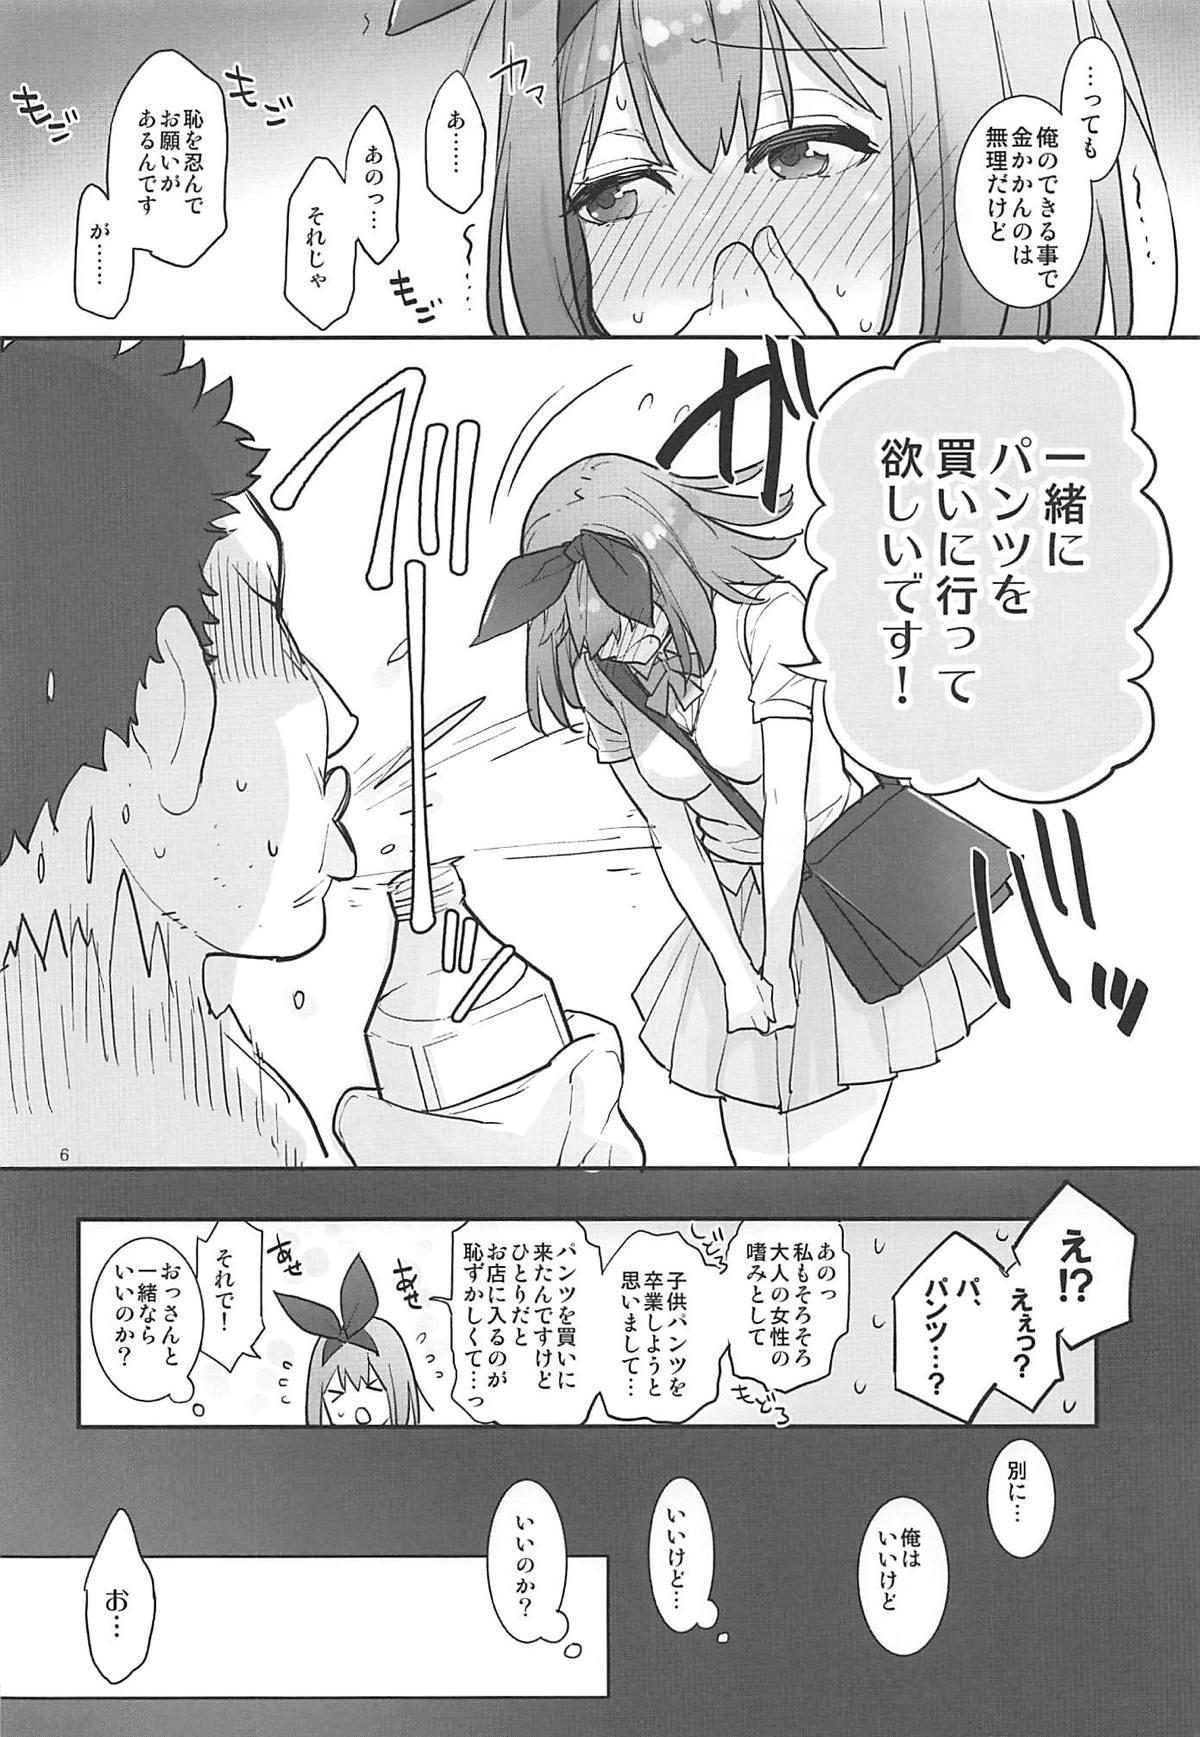 Yotsuba, Pants o Kai ni Iku 4